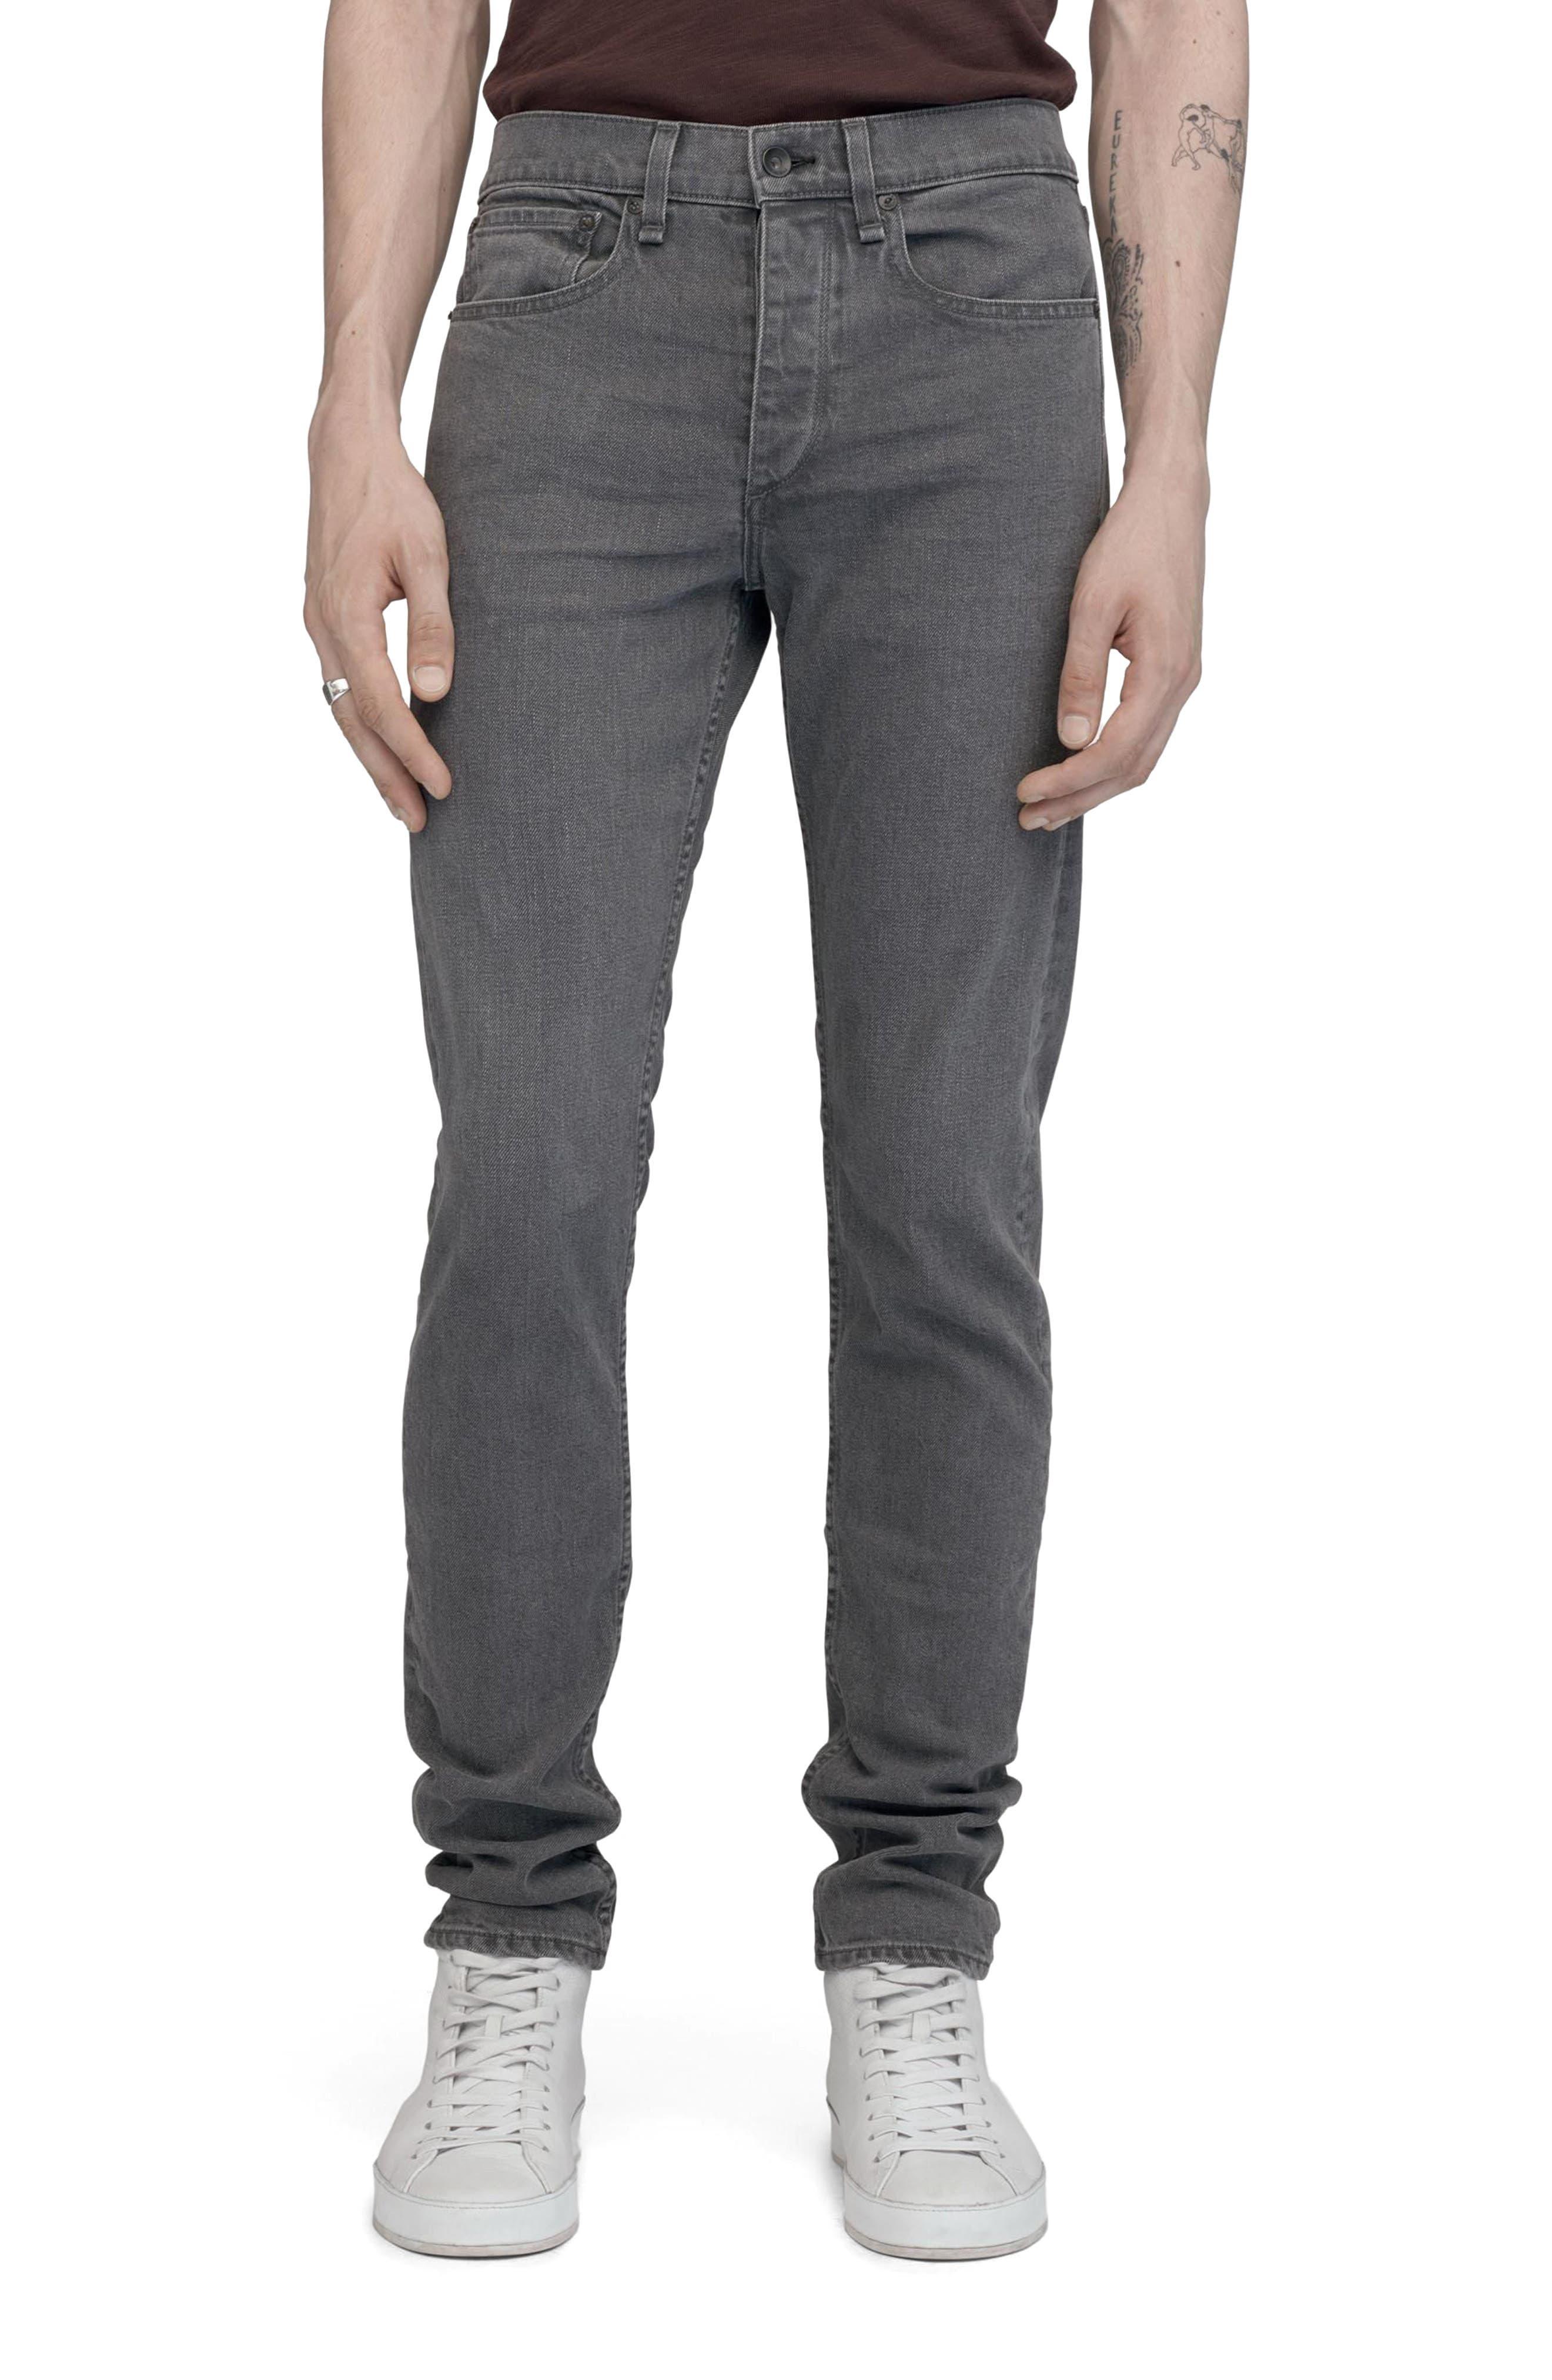 Fit 1 Skinny Fit Jeans,                         Main,                         color, Vesuvio